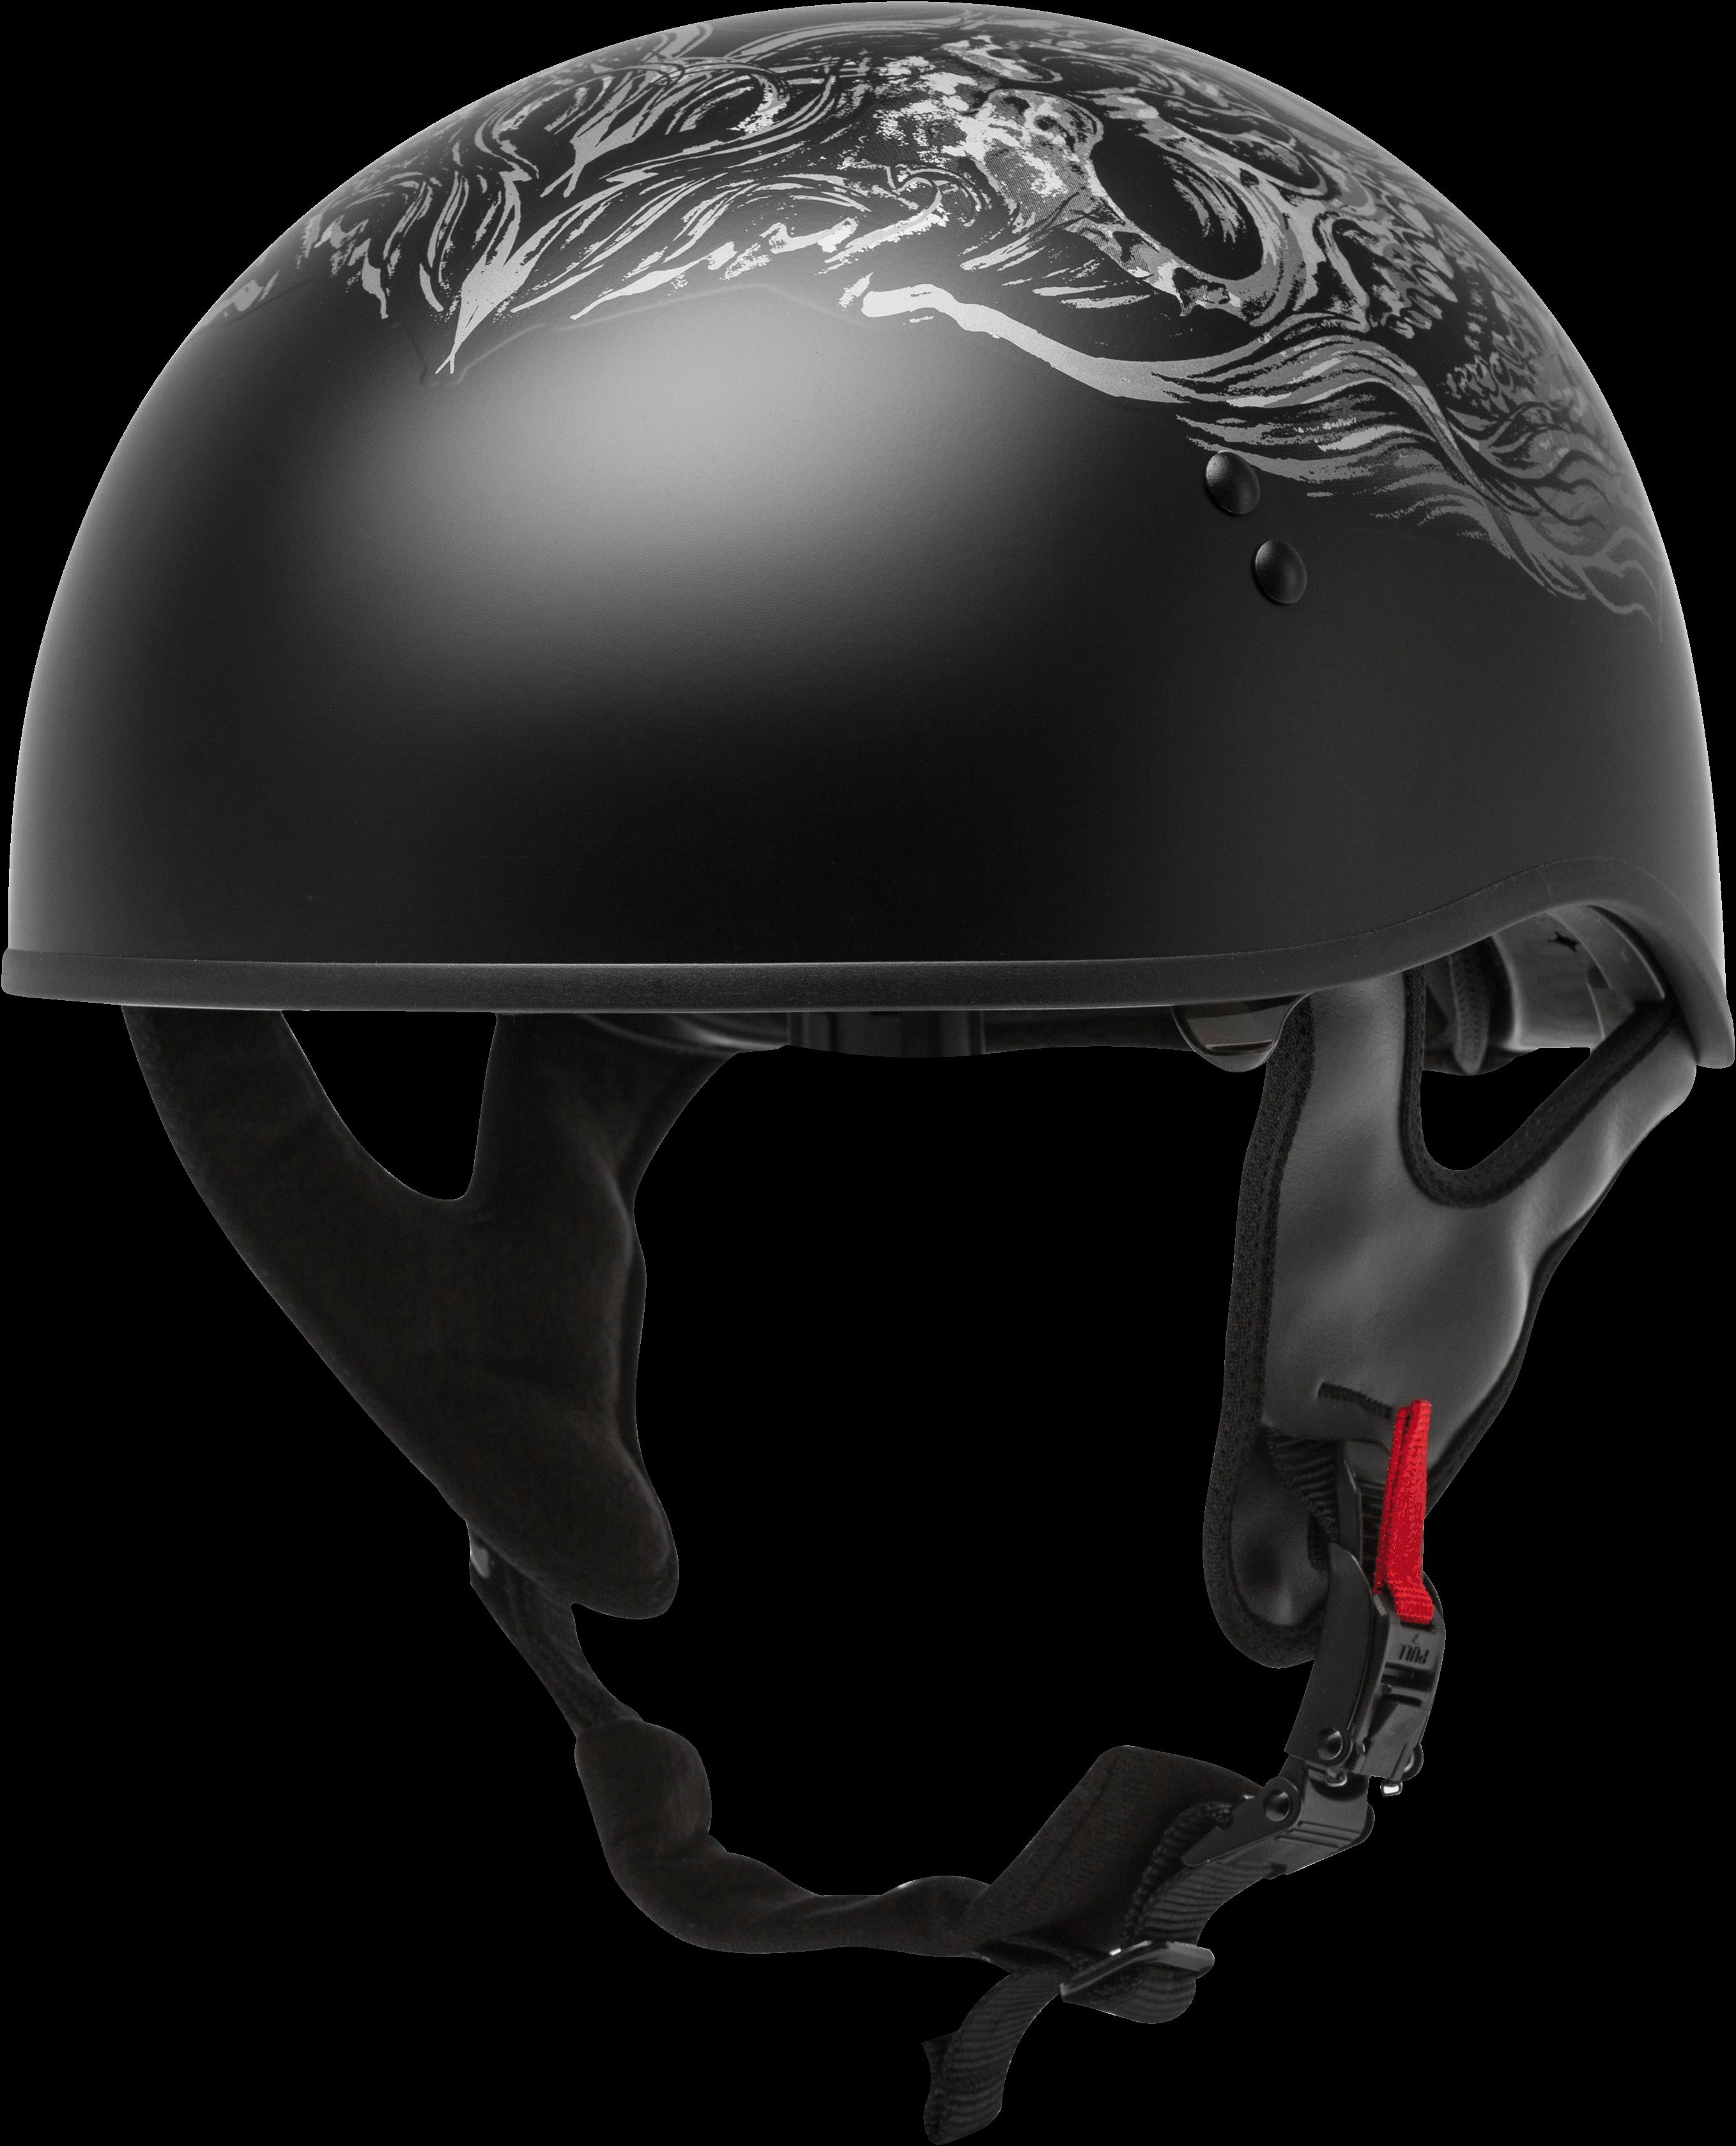 GMax GM65 Naked Ghost / RIP Helmet | 10% ($8.49) Off